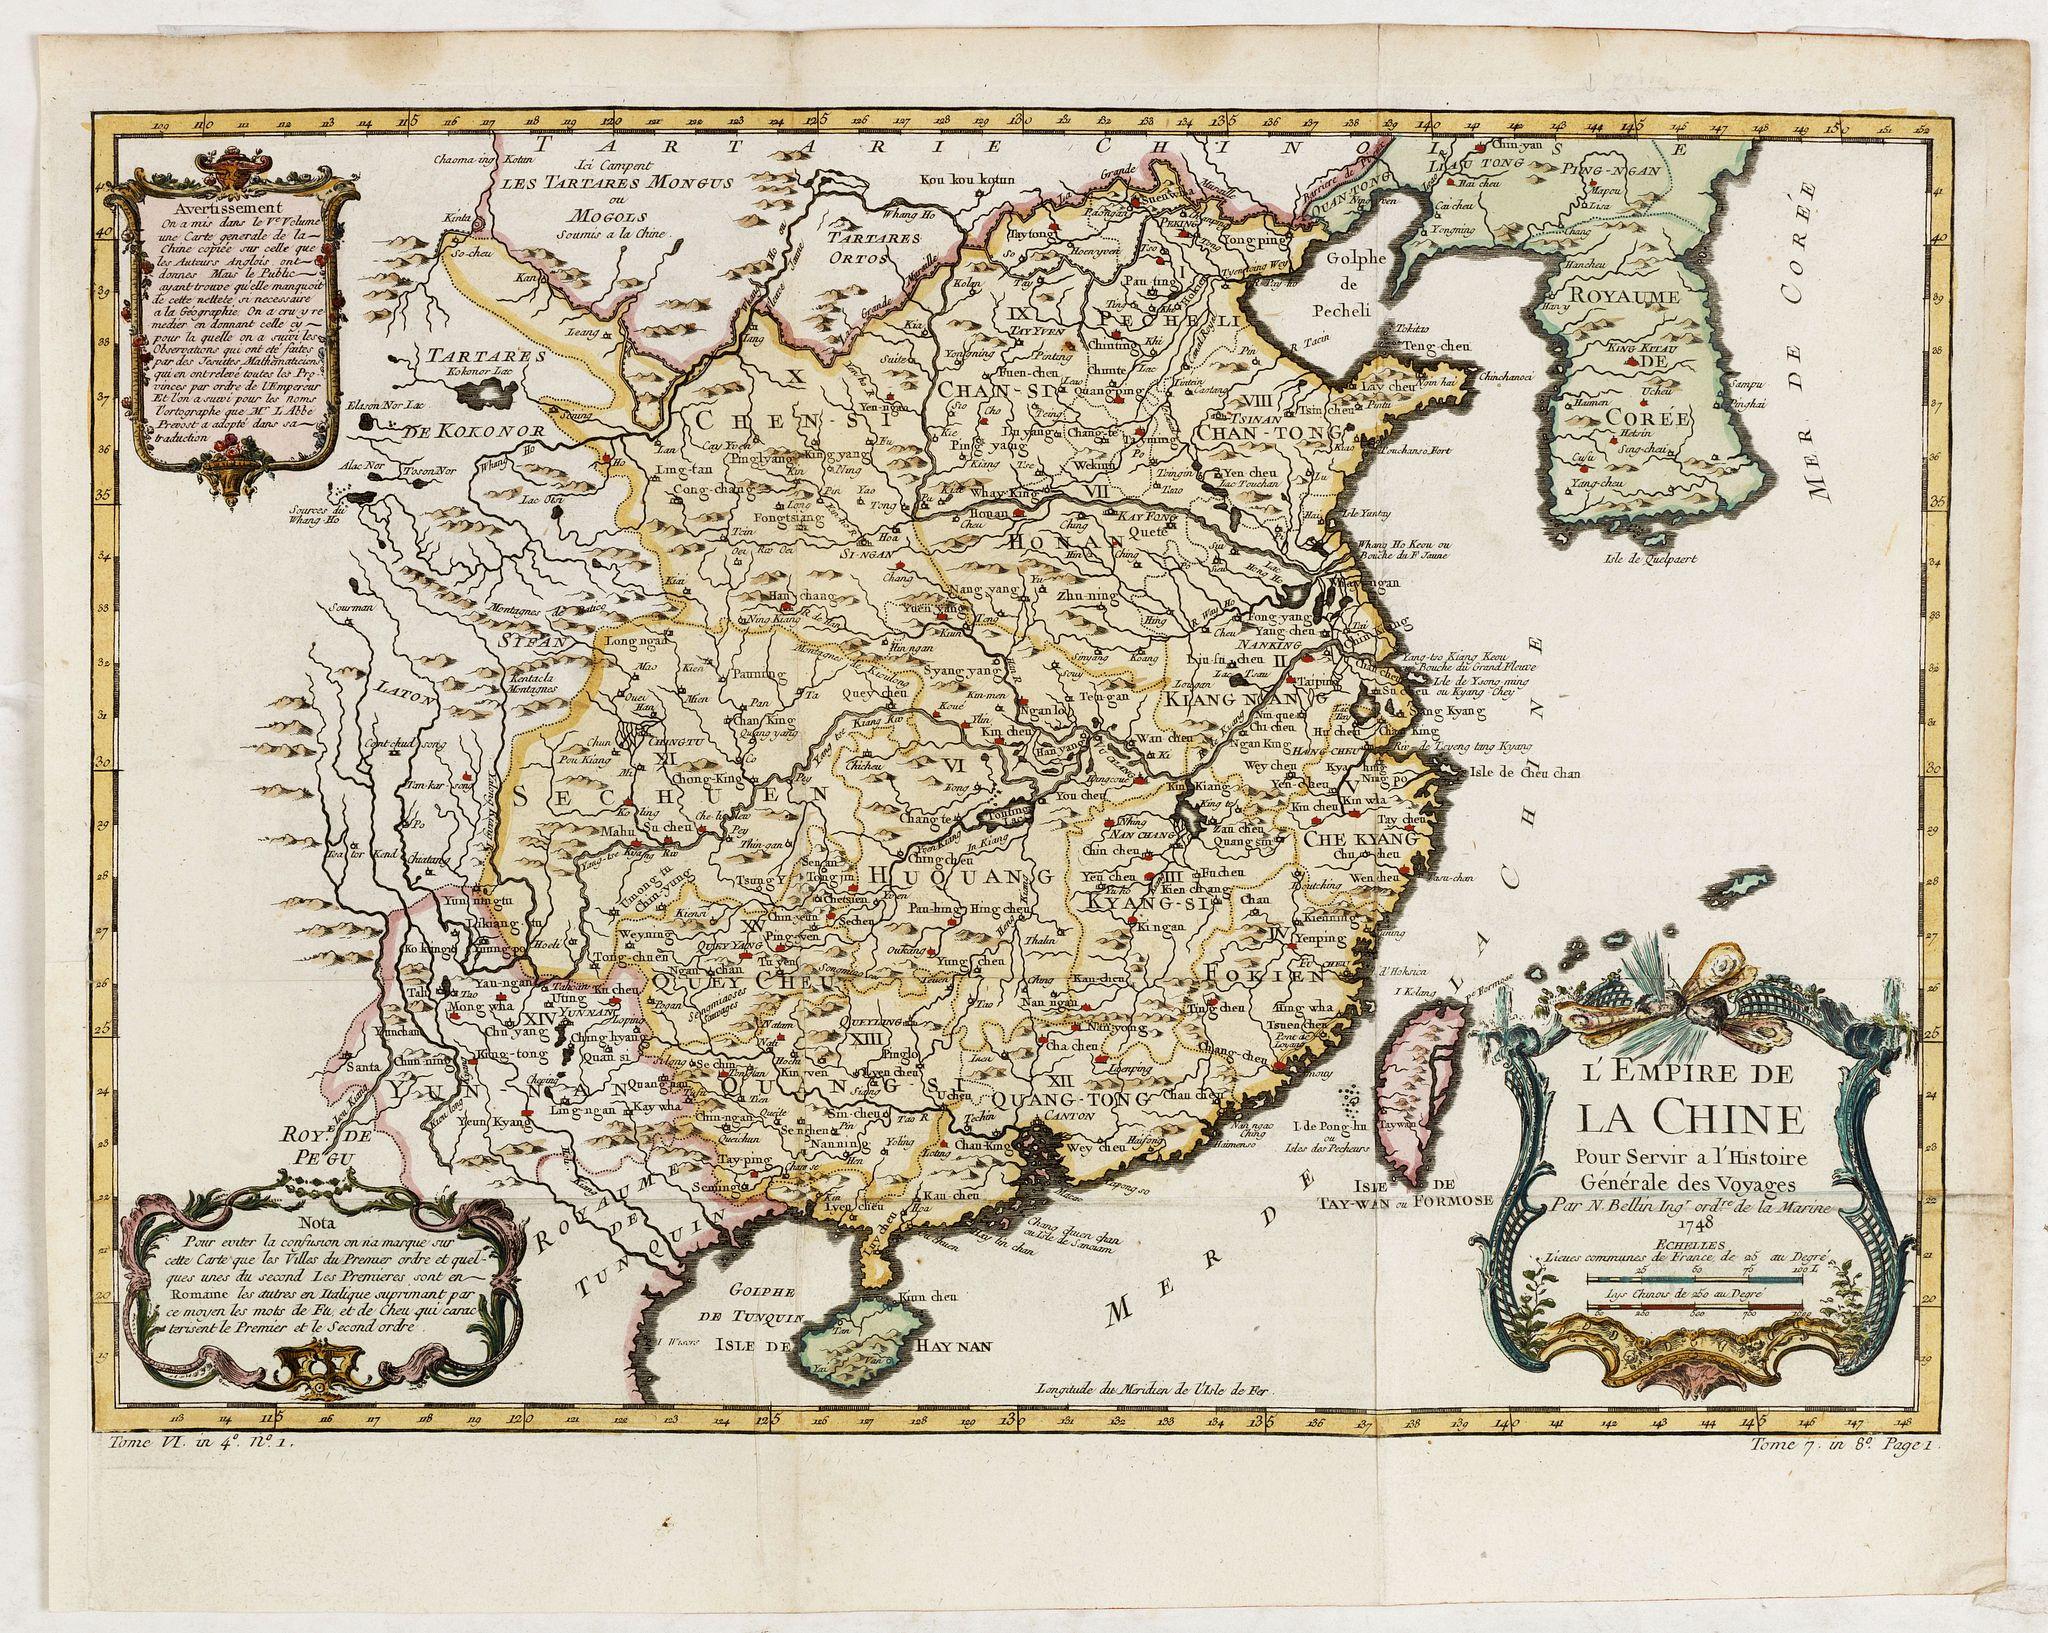 BELLIN, J.N. -  L'Empire de la Chine. . .